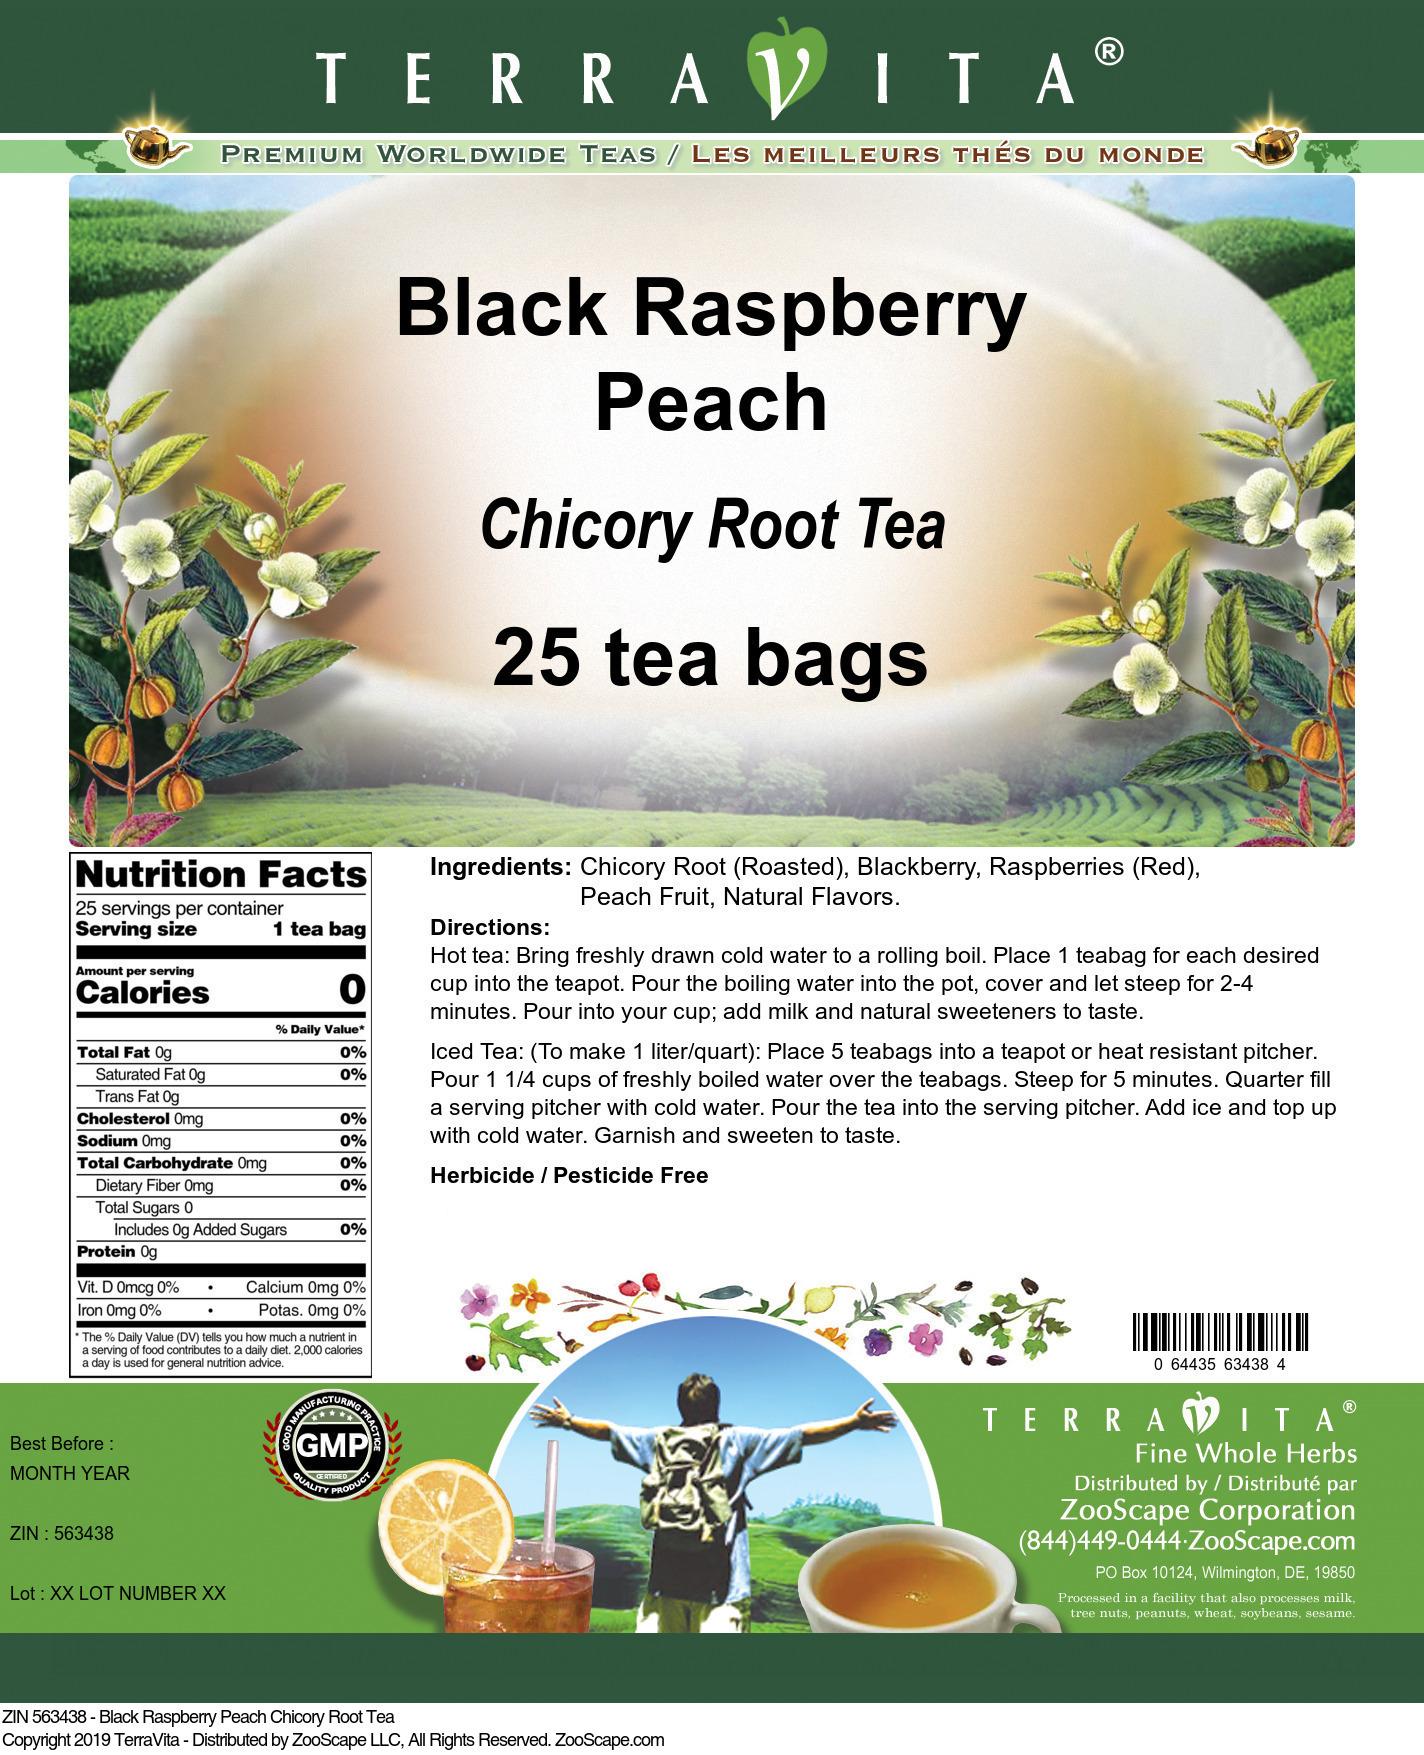 Black Raspberry Peach Chicory Root Tea